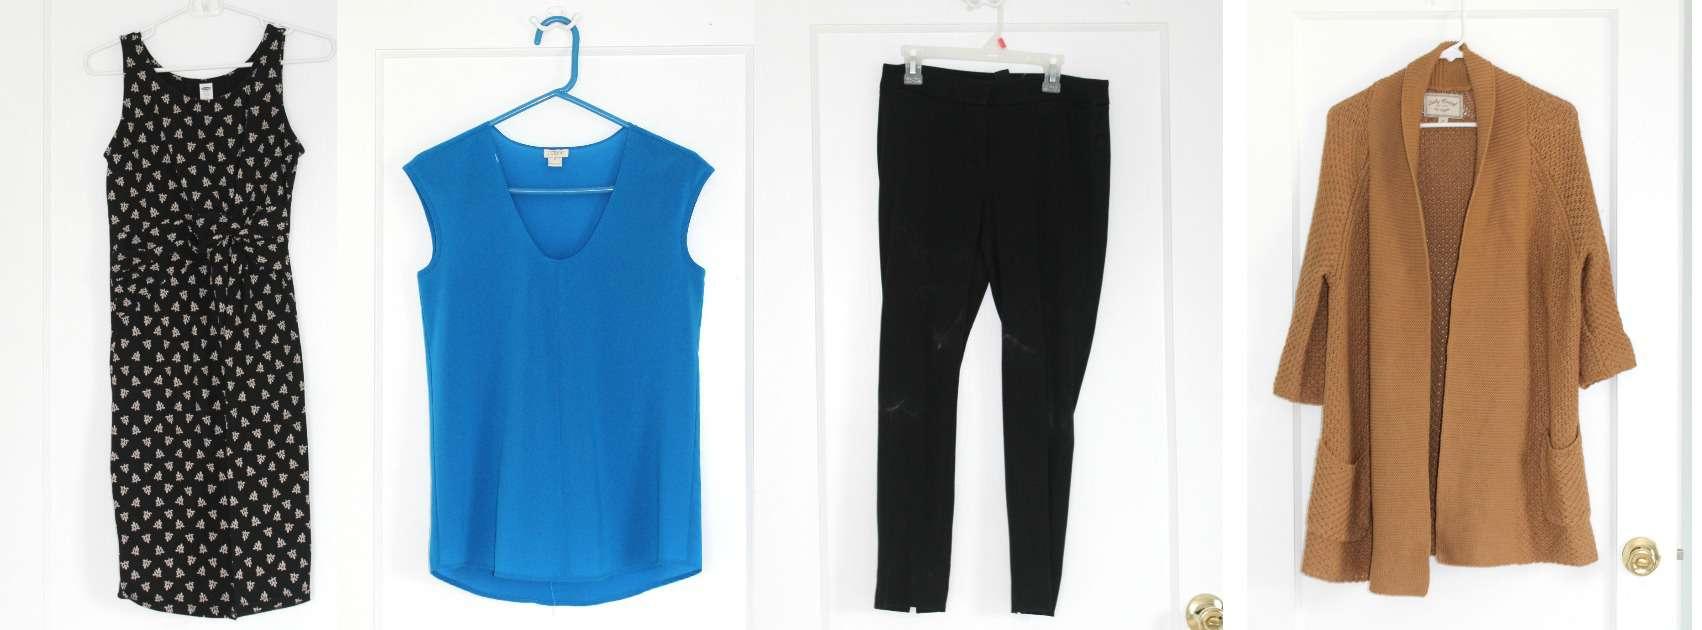 First Capsule Wardrobe Basics